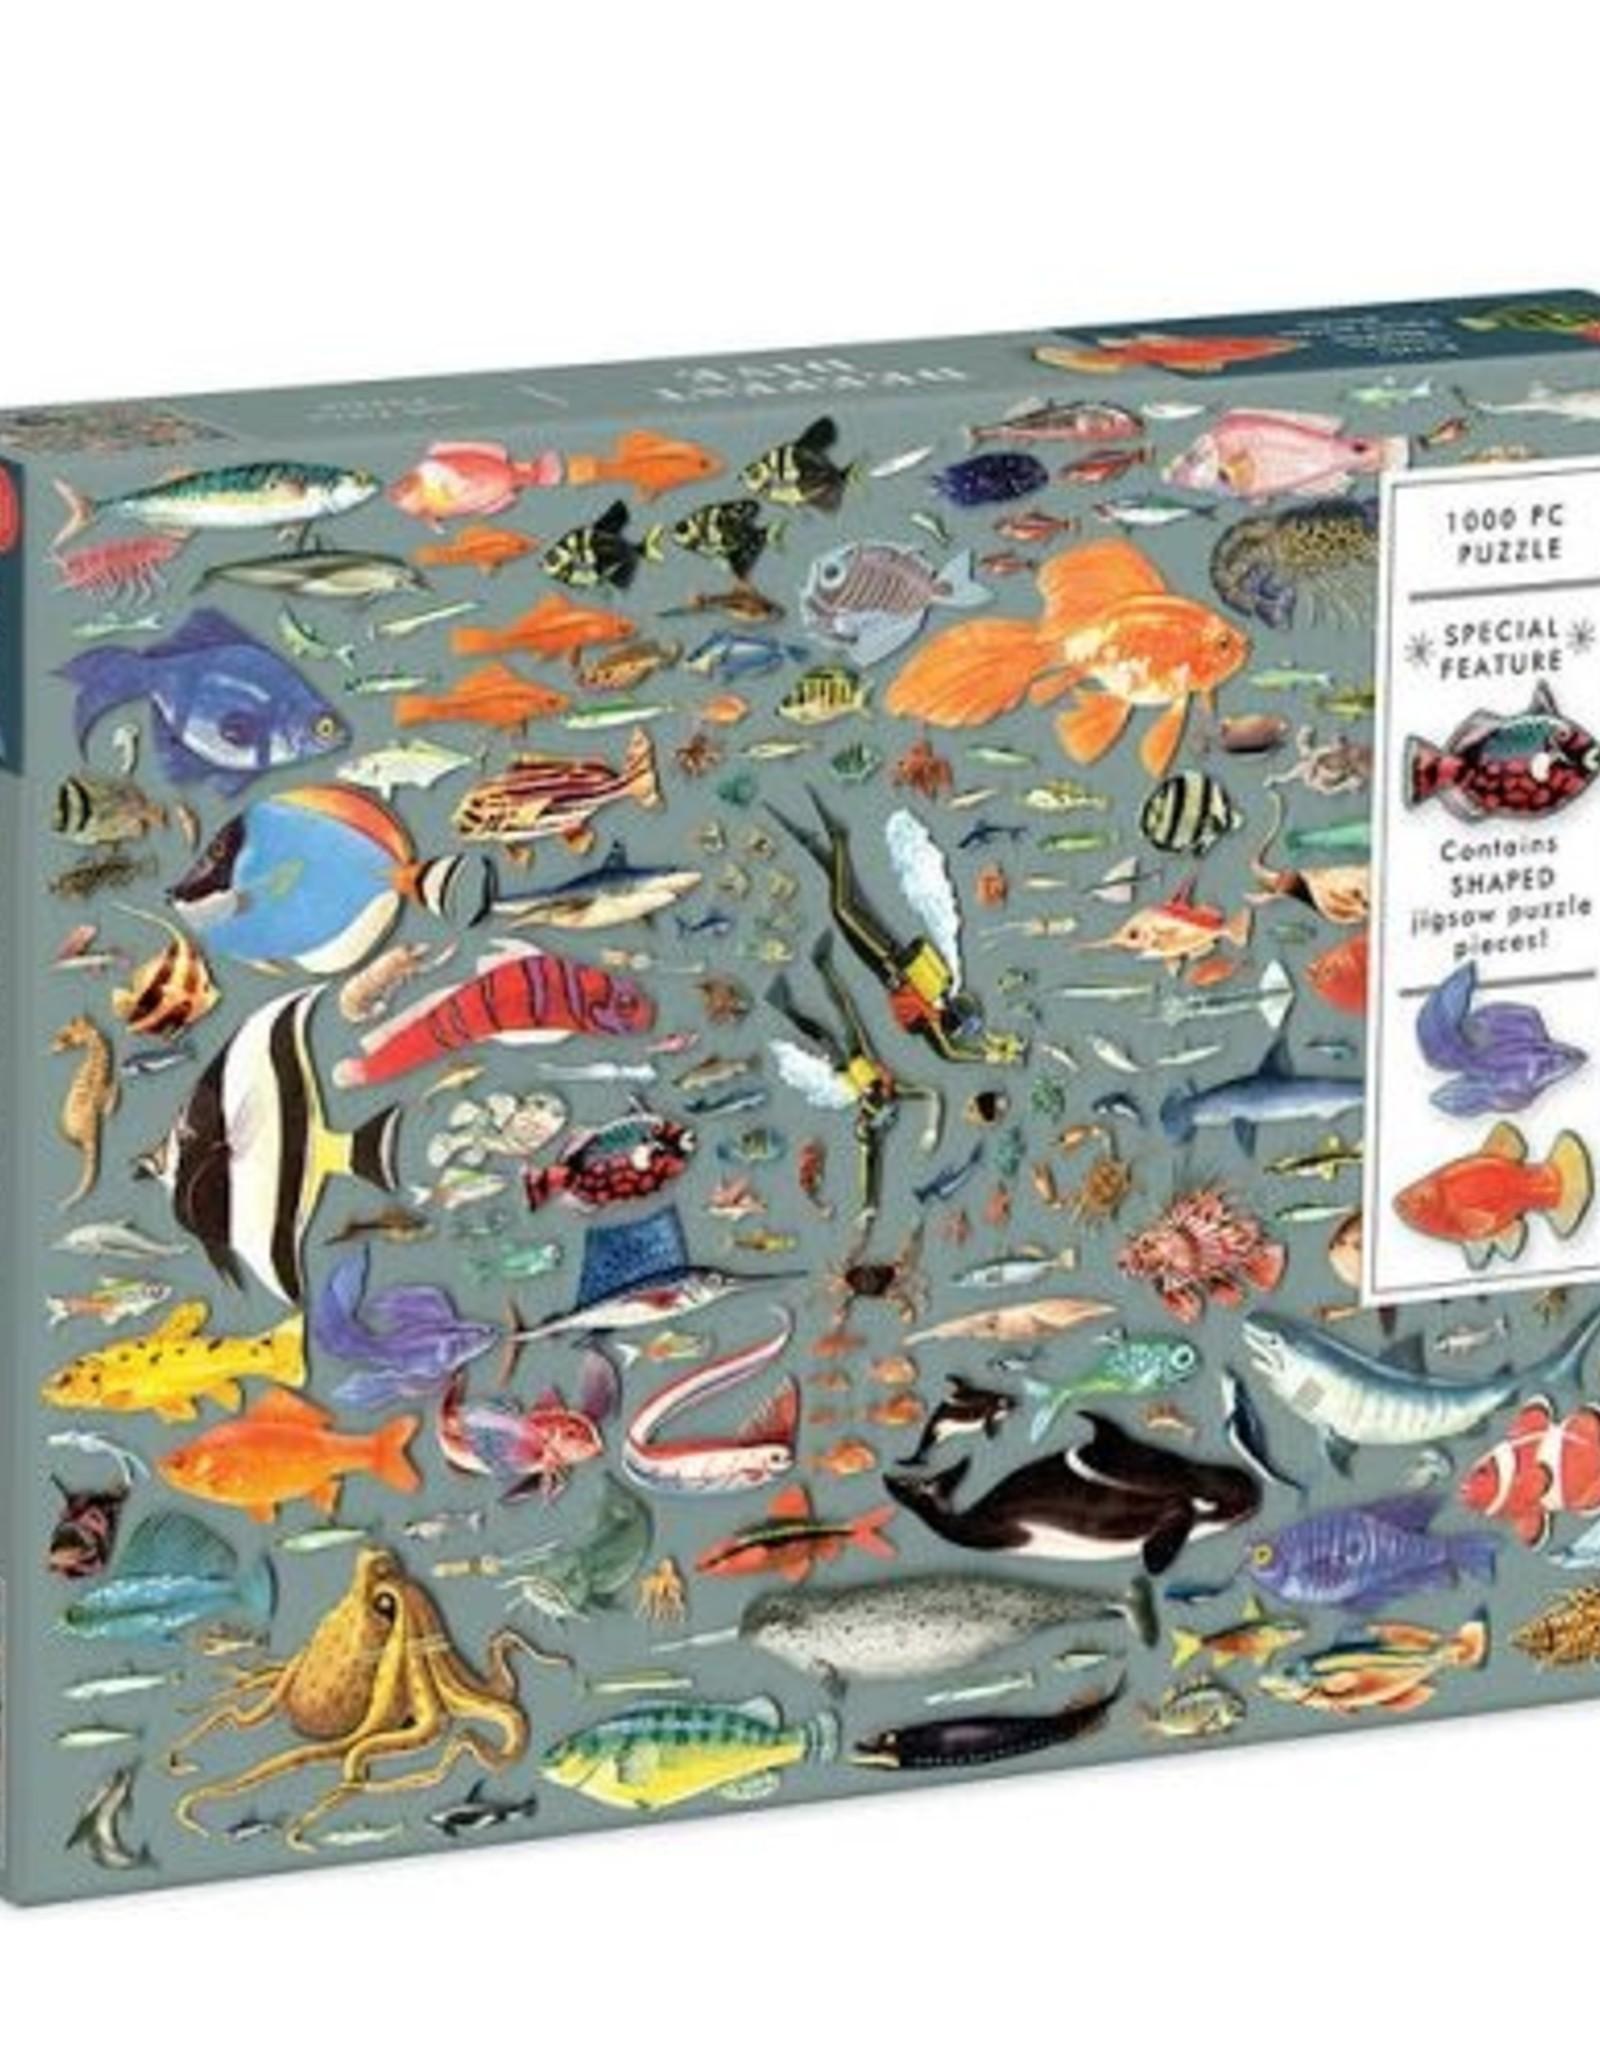 Puzzle 1000 Piece: The Deepest Dive